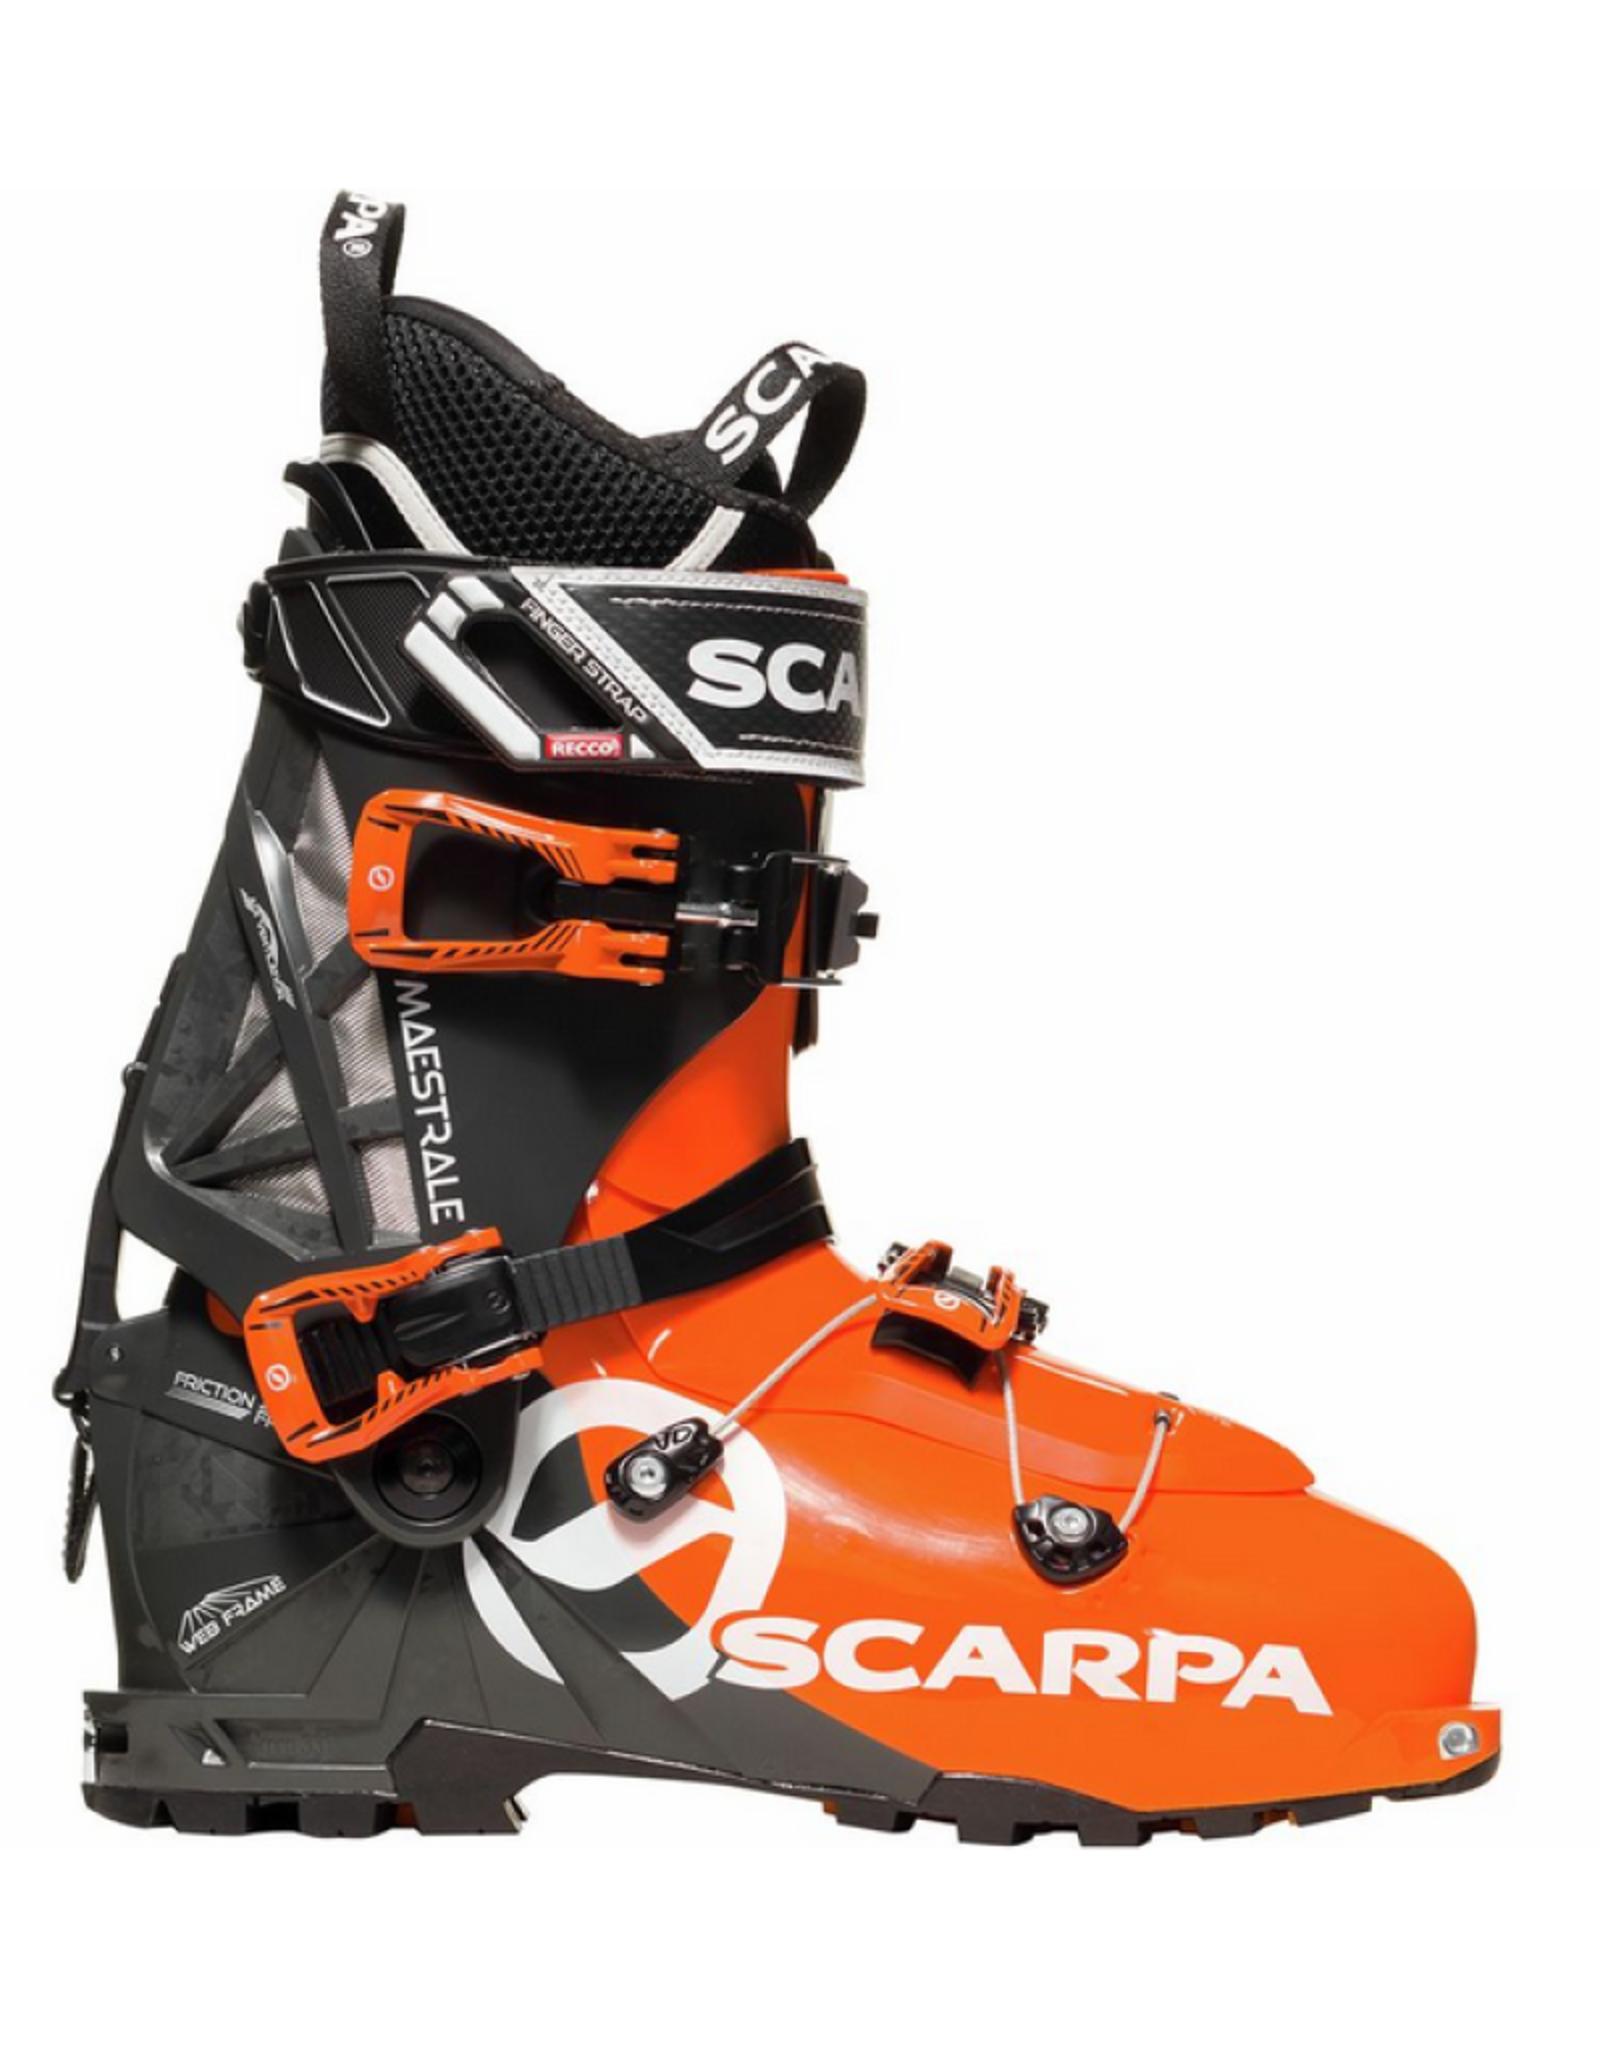 SCARPA Maestrale AT Ski Boots 20/21